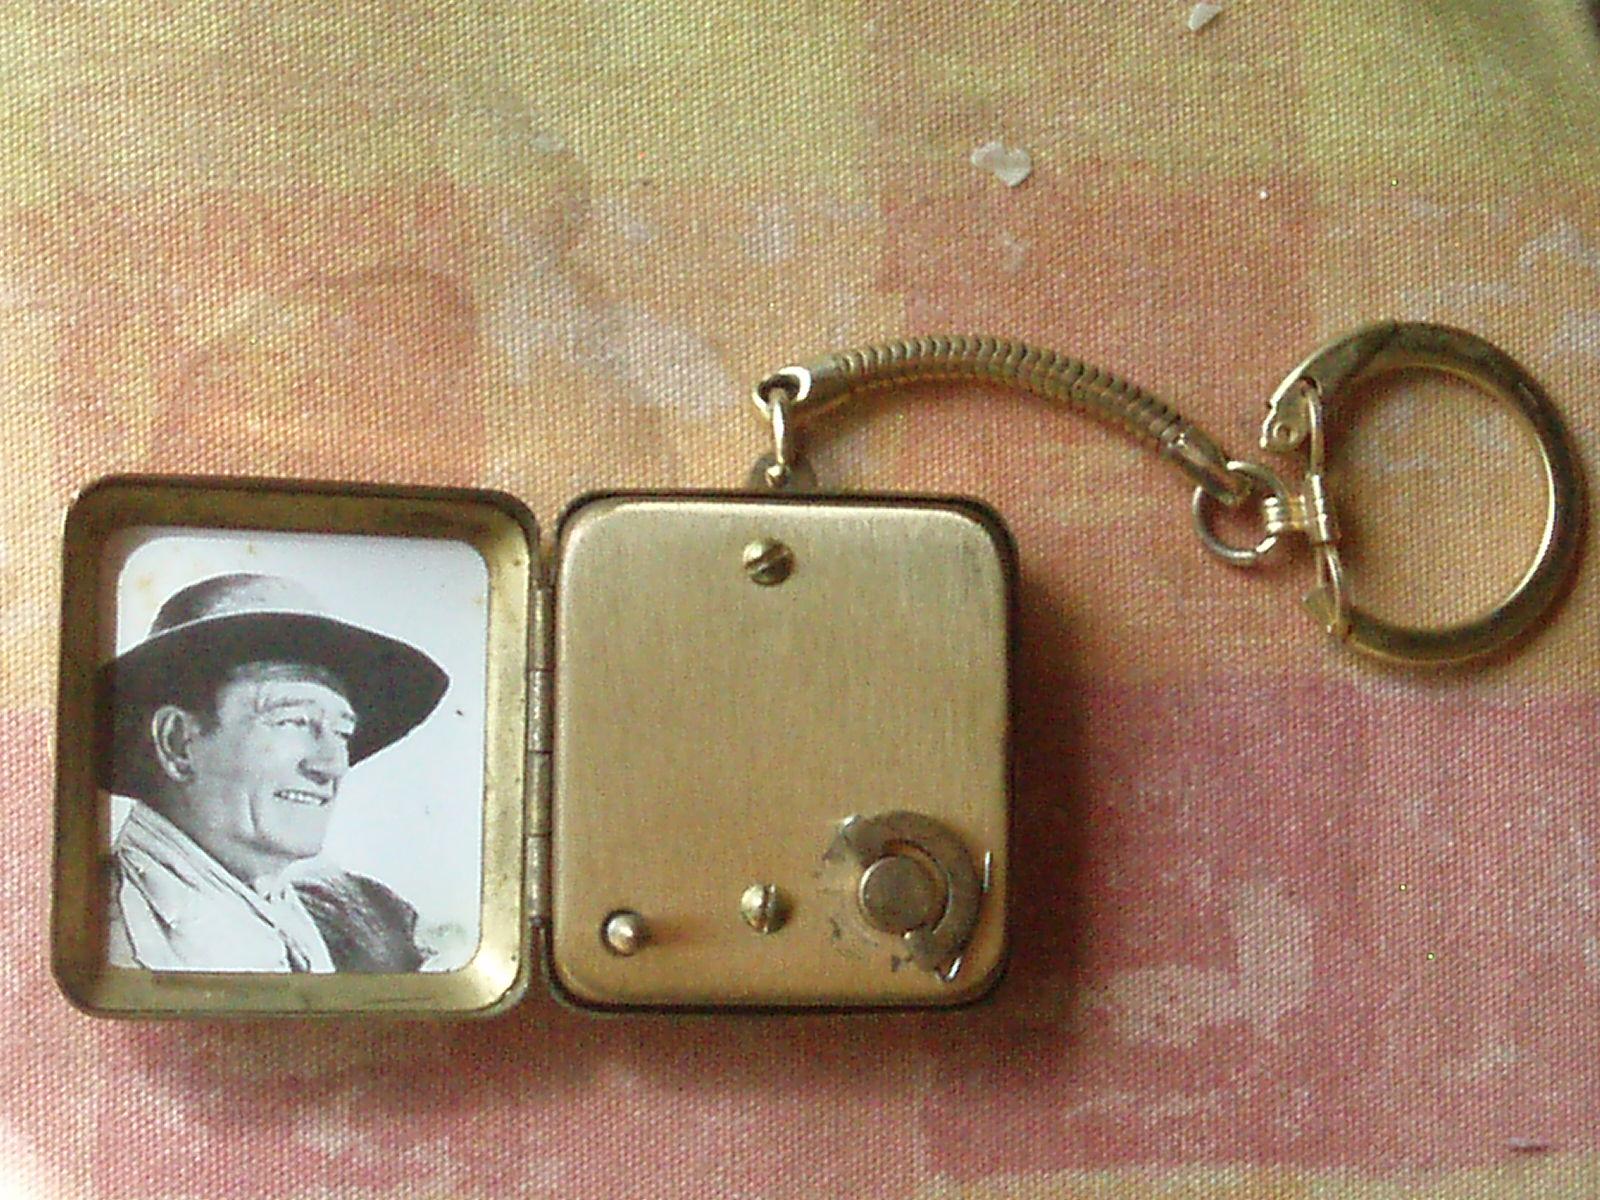 Music Box Owned By John Wayne Antique Appraisal Instappraisal